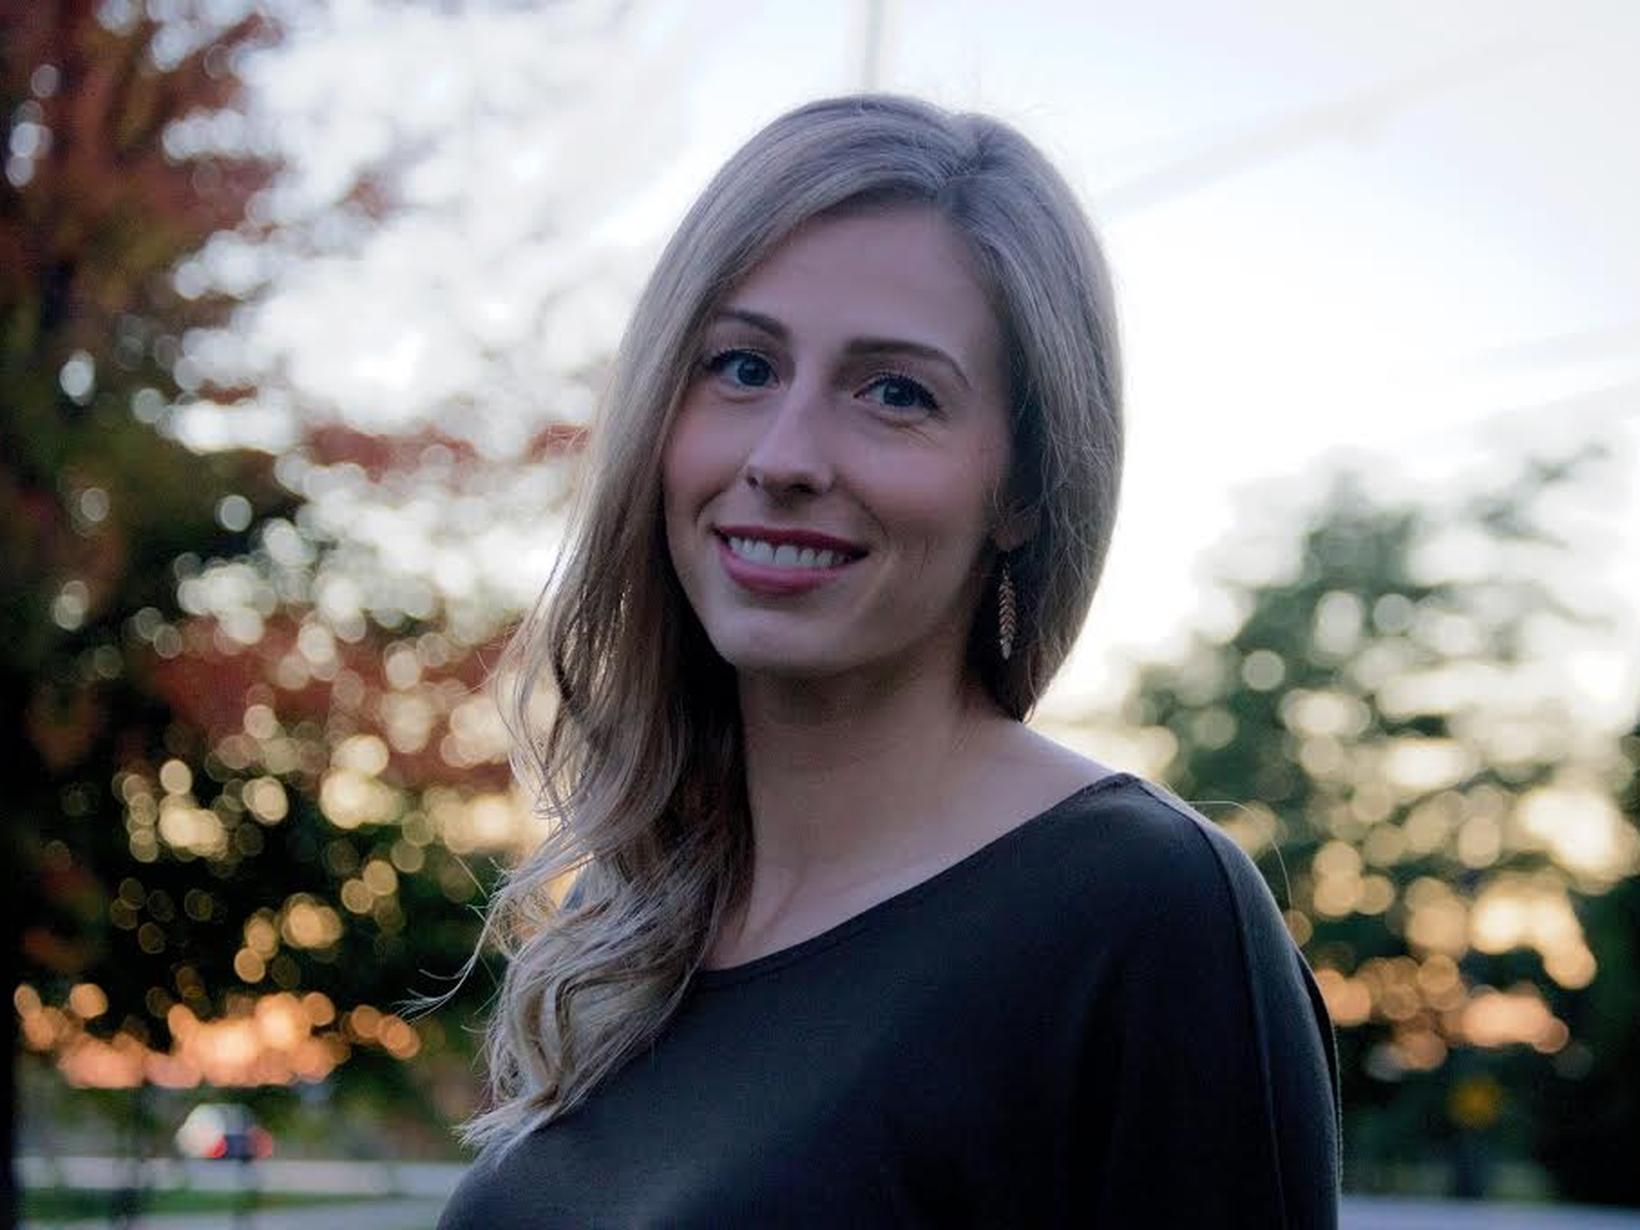 Jessica from Newcastle Village, Ontario, Canada